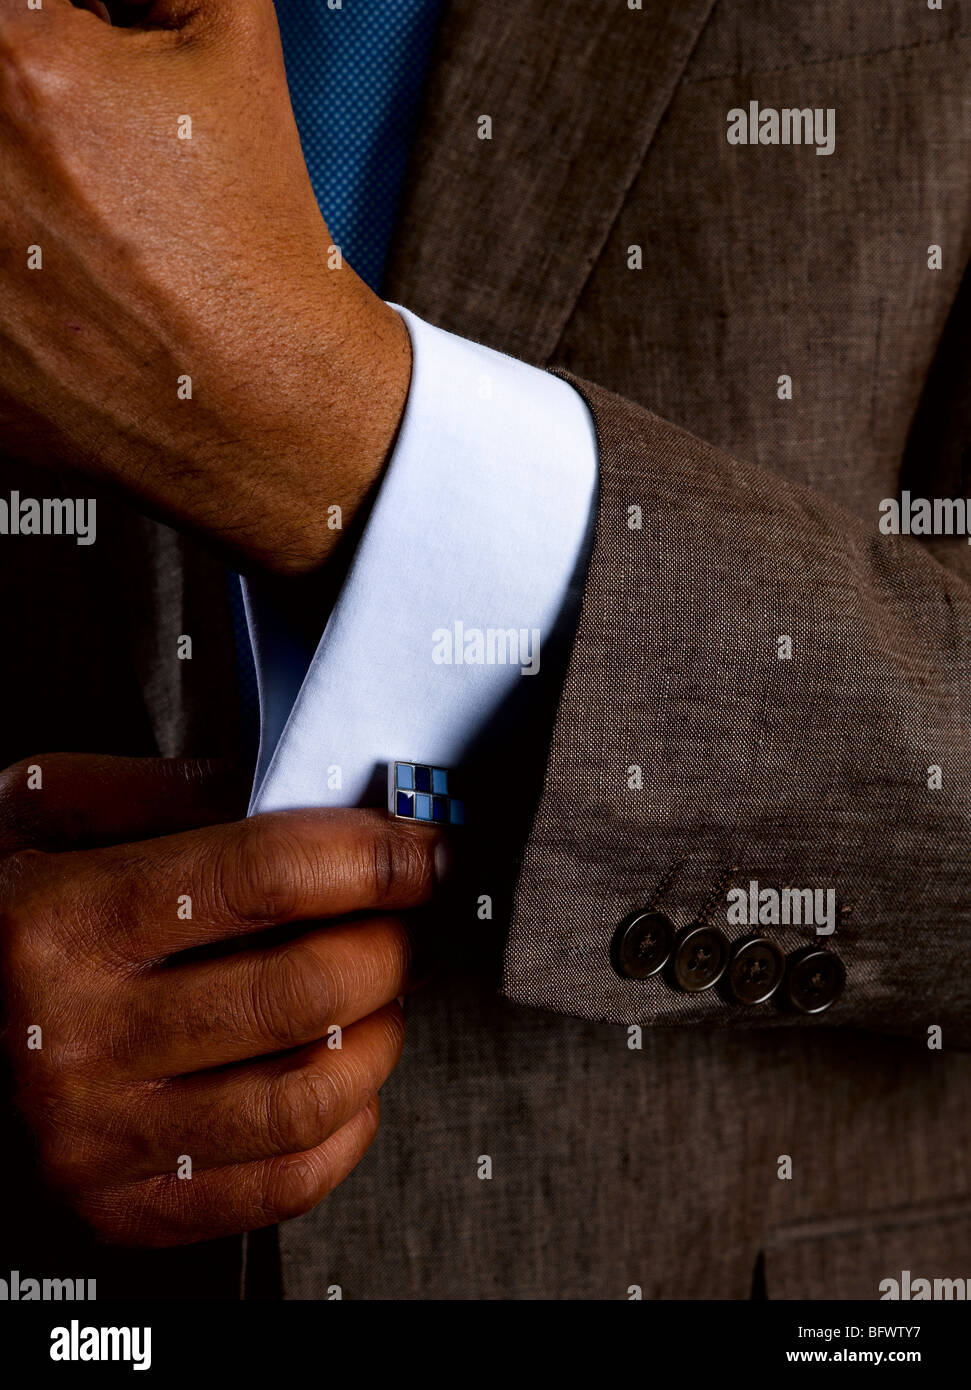 Business man adjusting cuff links - Stock Image